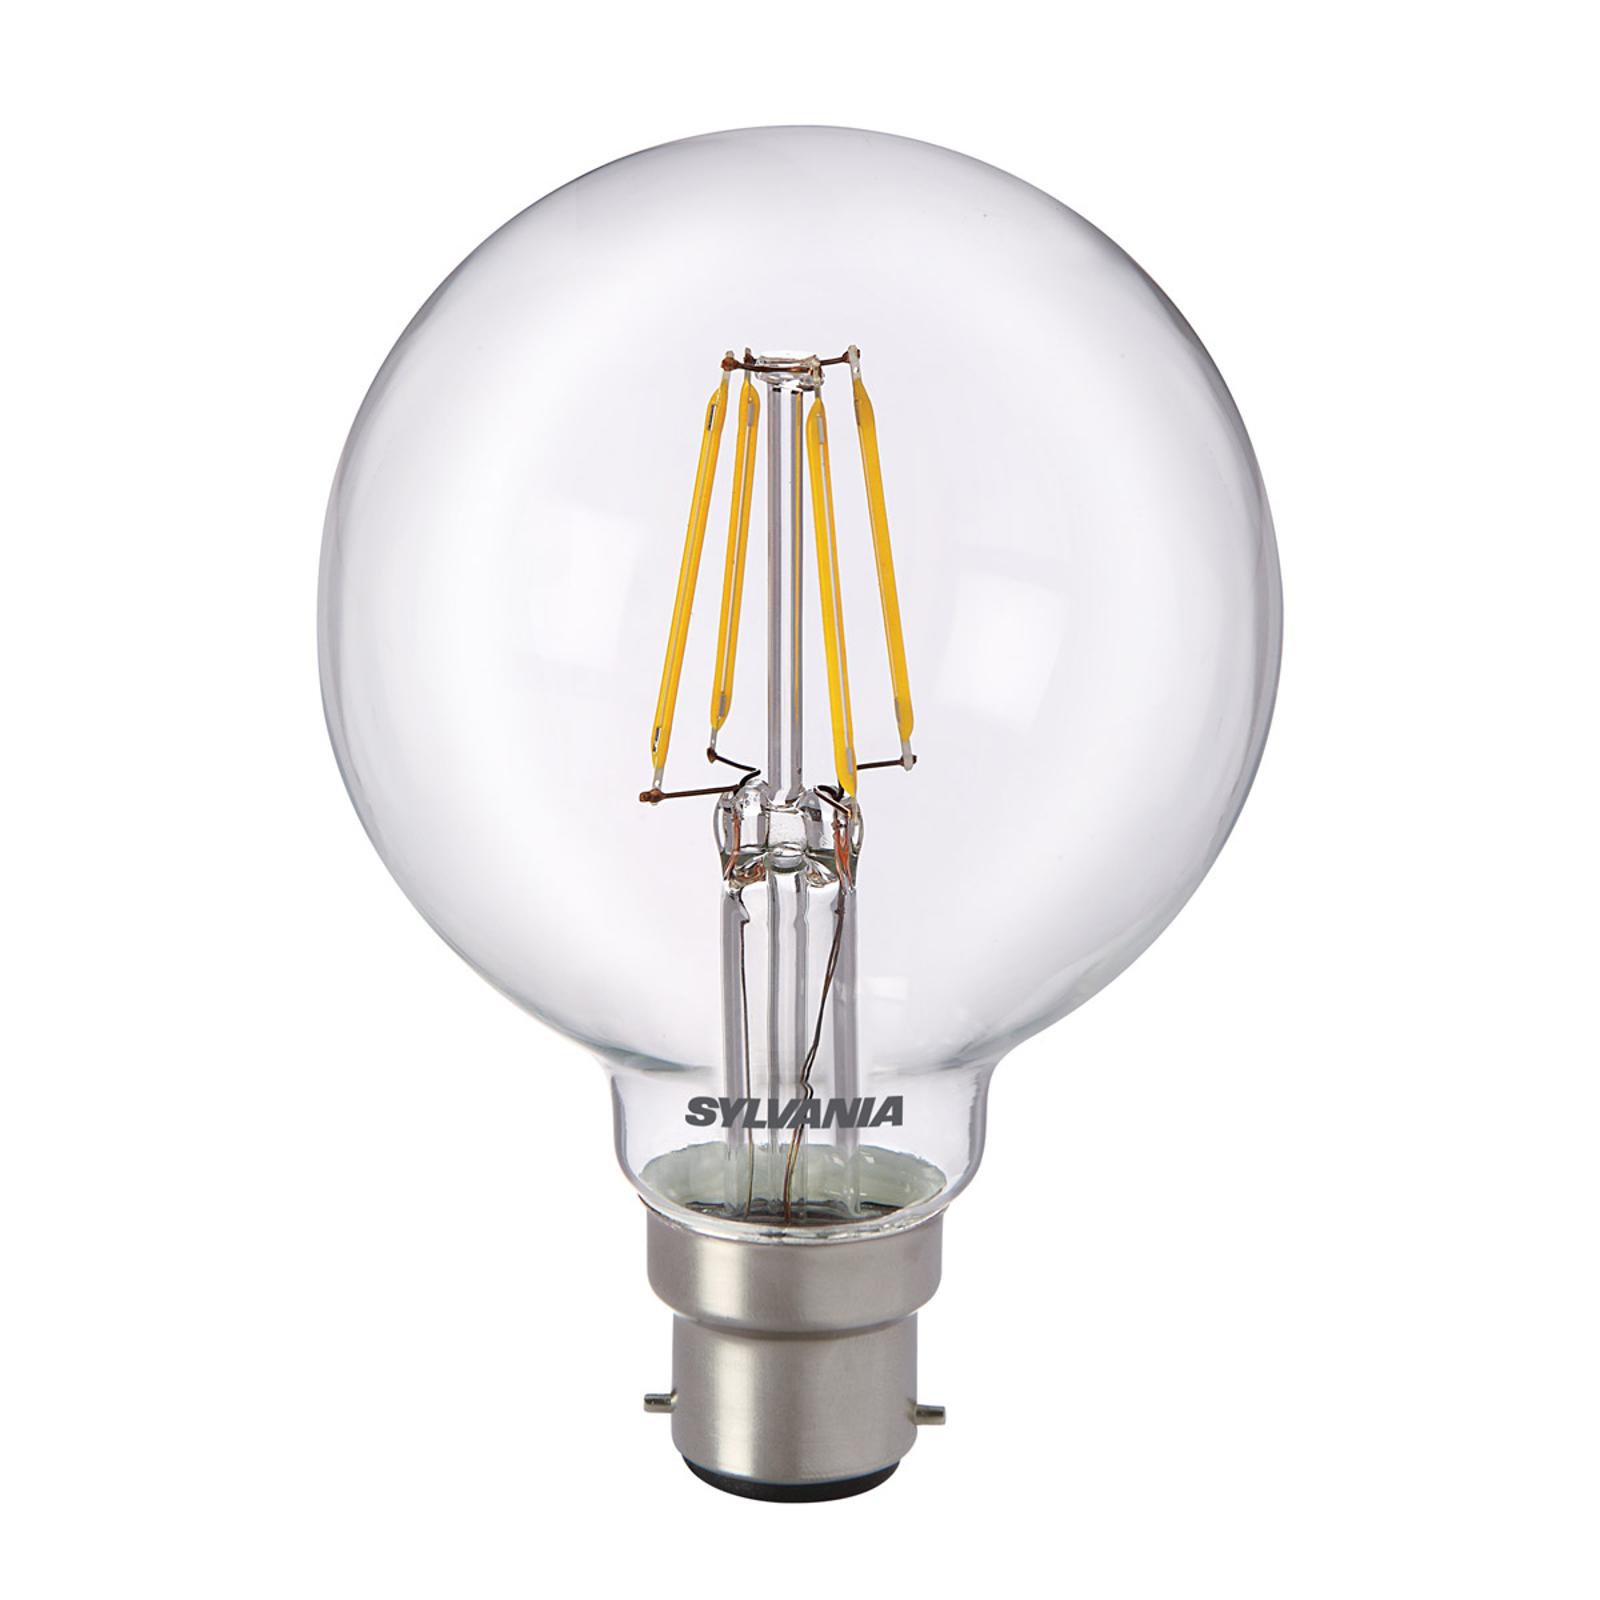 B22 5W 827 LED globepære, klar